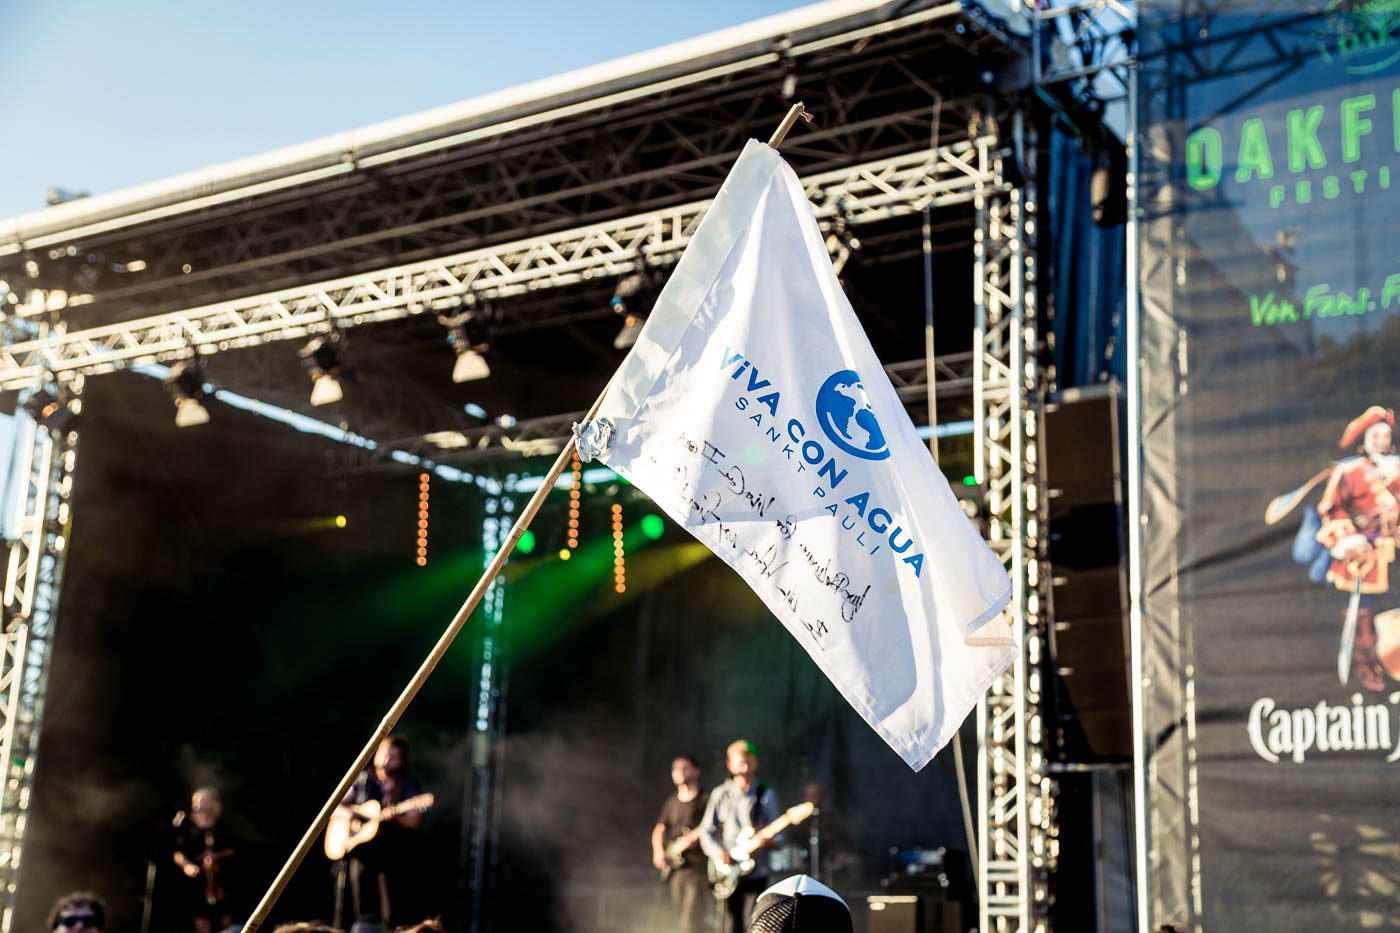 160806-Oakfield-Festival-SchroederART-62